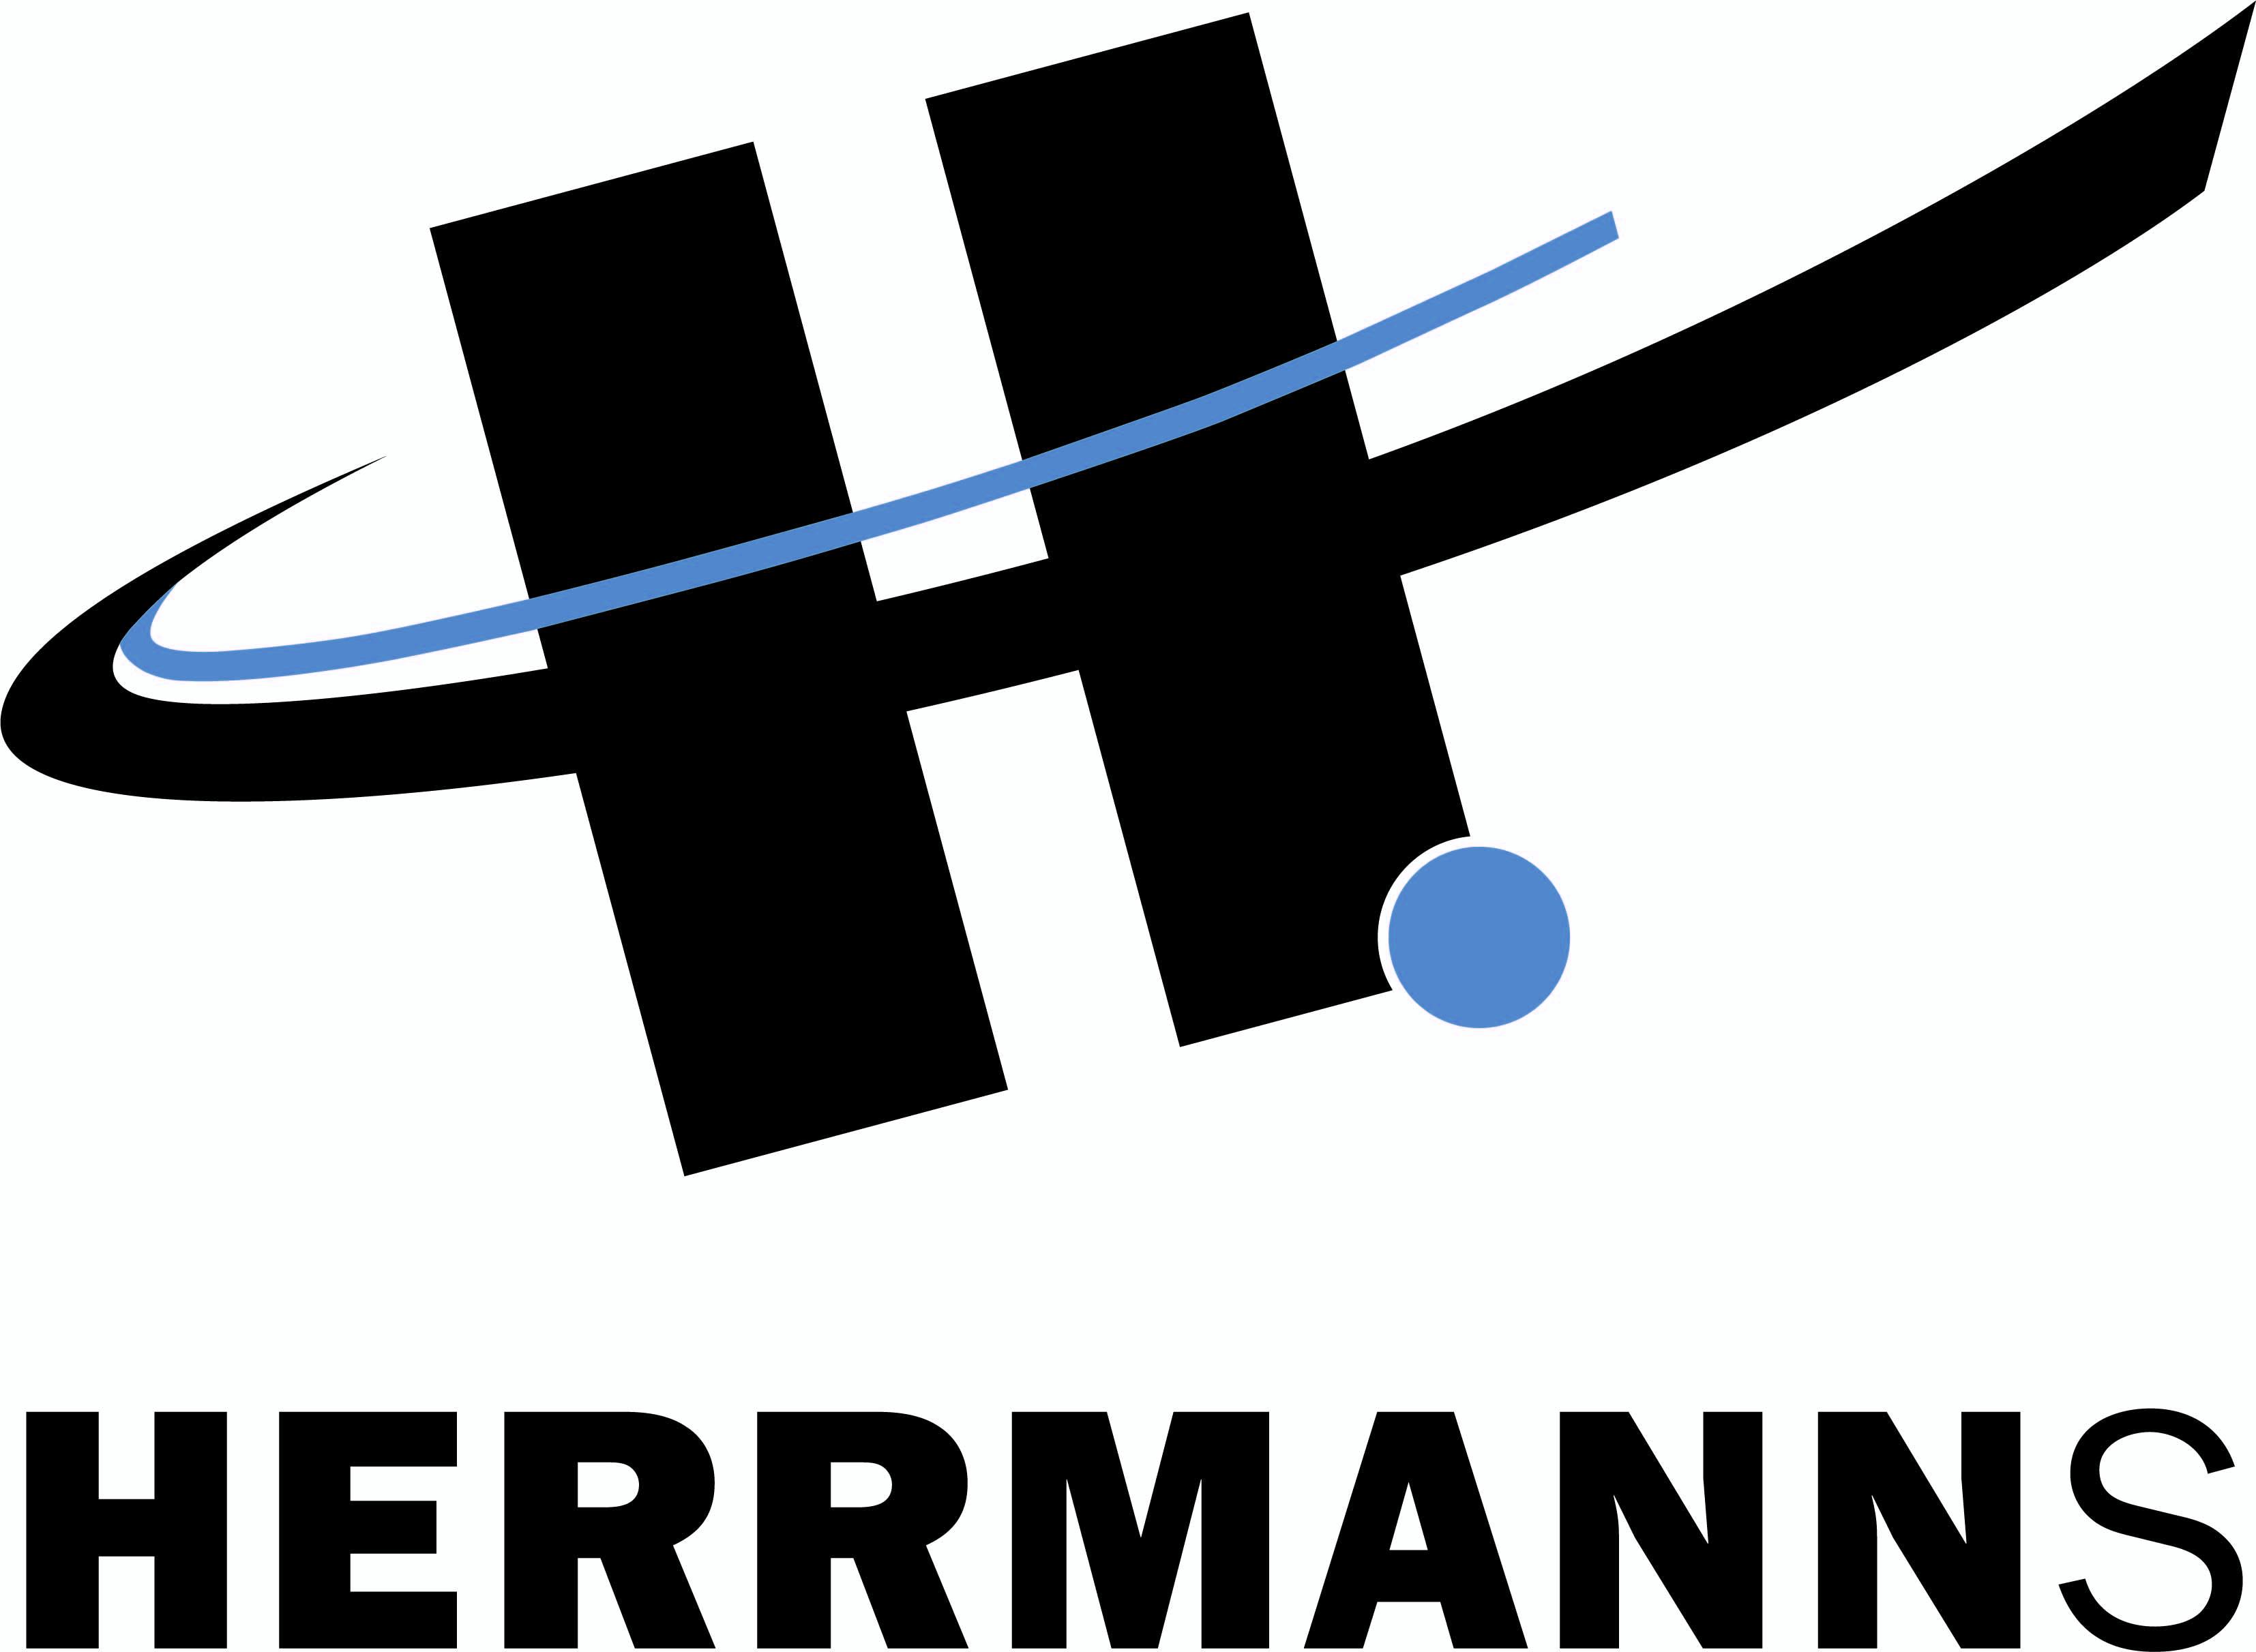 Hermanns Kfz-Technik